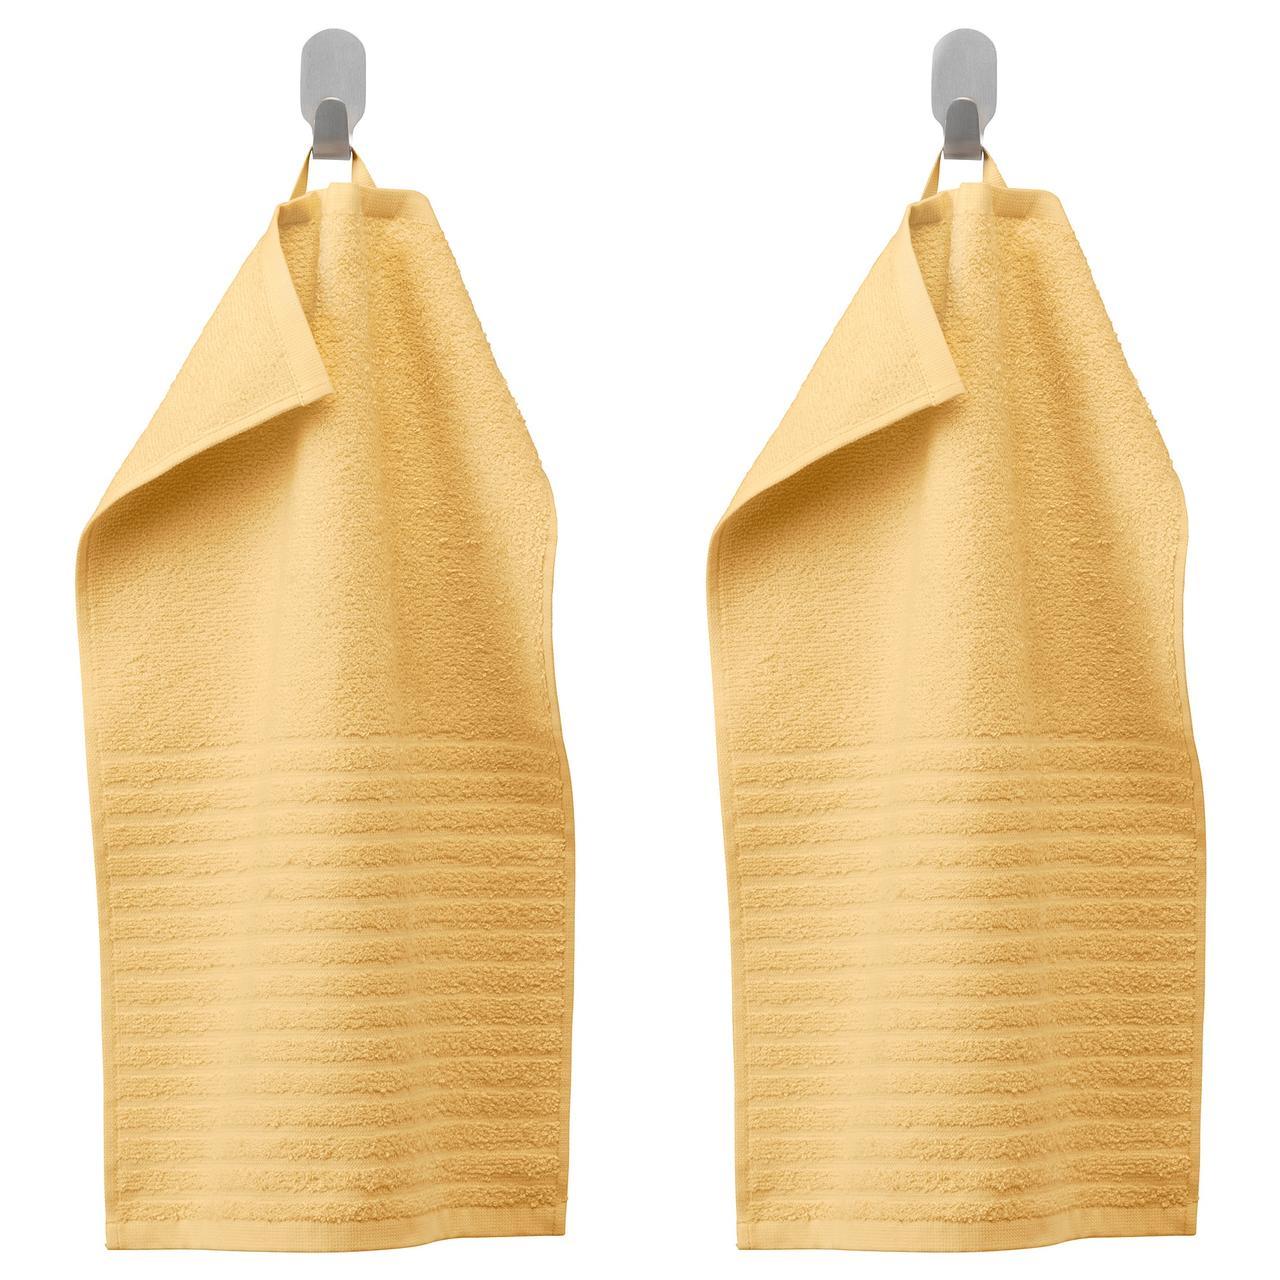 ВОГШЁН Полотенце, светло-желтый